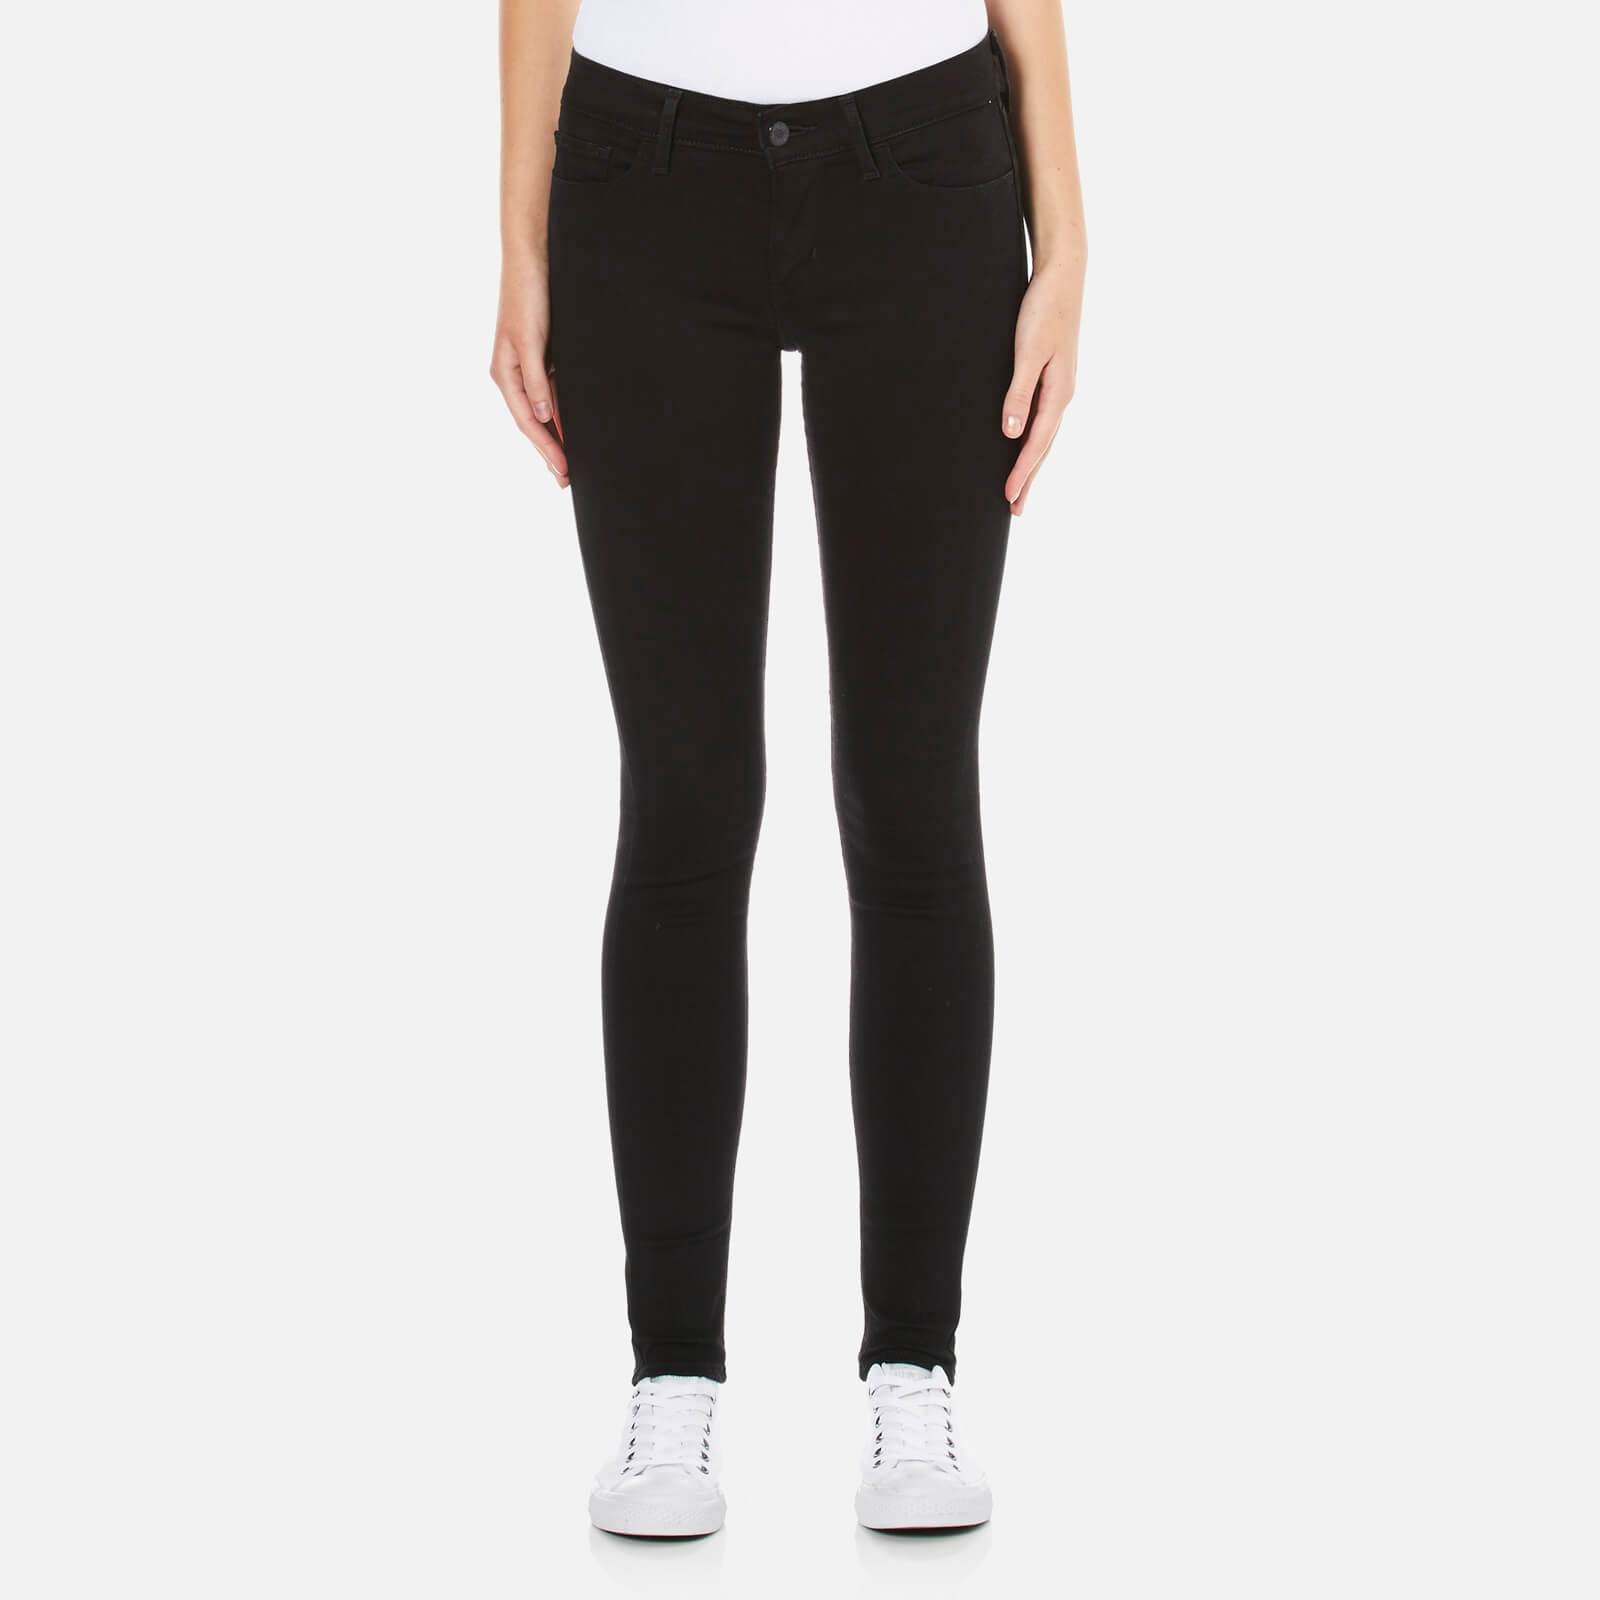 613378e9 Levi's Women's 710 FlawlessFX Super Skinny Jeans - Black Cove Clothing |  TheHut.com